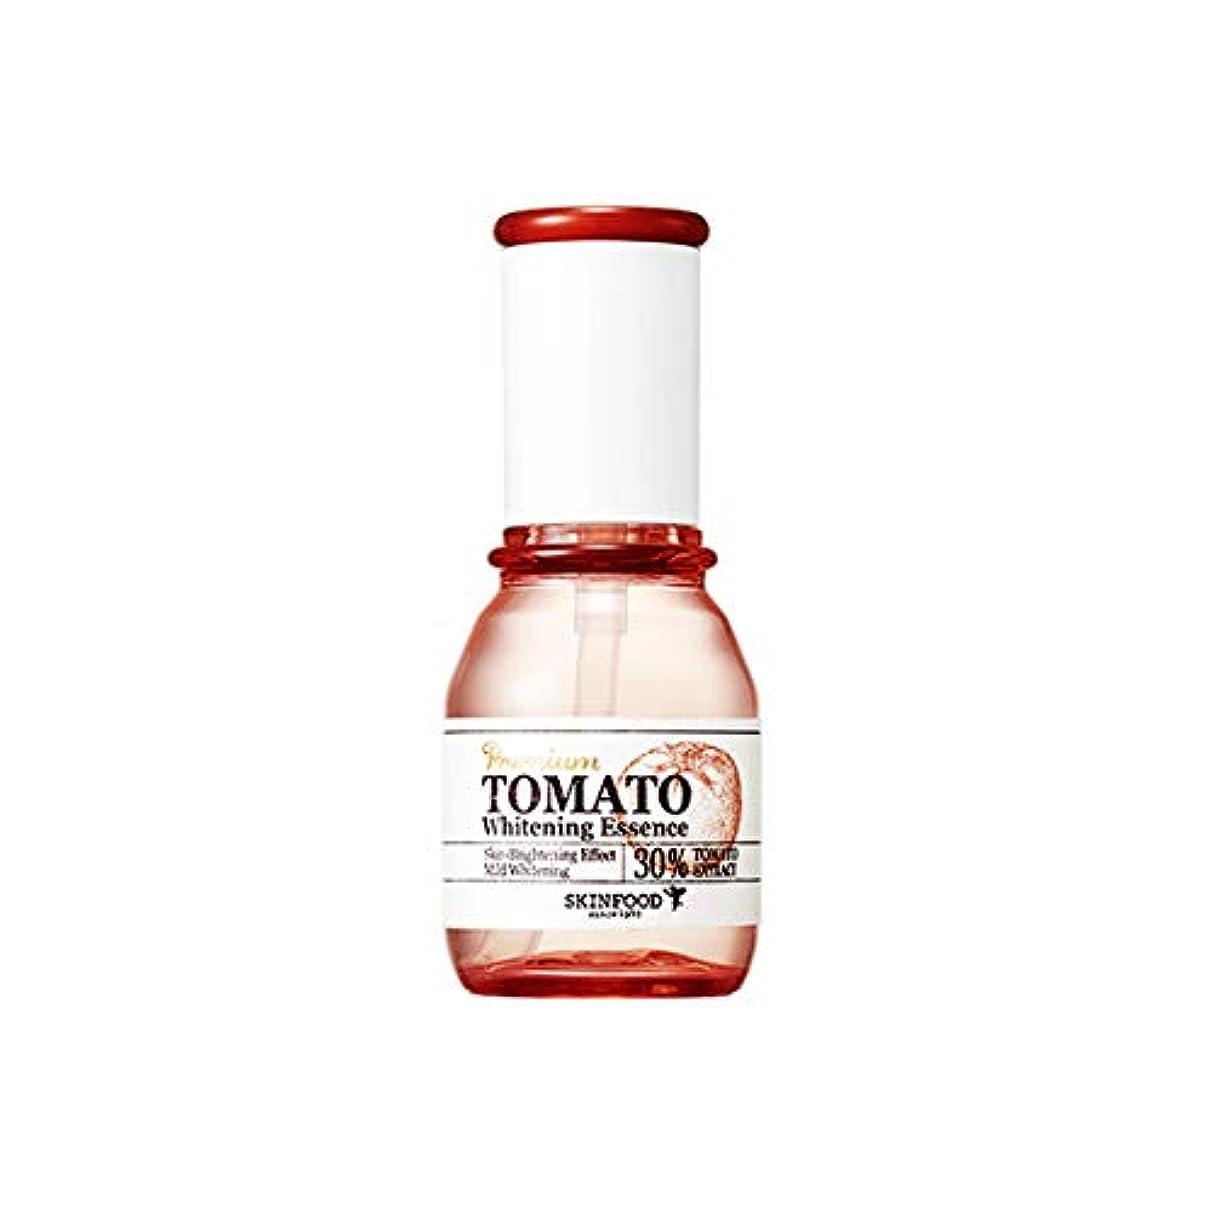 Skinfood プレミアムトマトホワイトニングエッセンス(美白効果) / Premium Tomato Whitening Essence (Skin-Brightening Effect)50ml [並行輸入品]